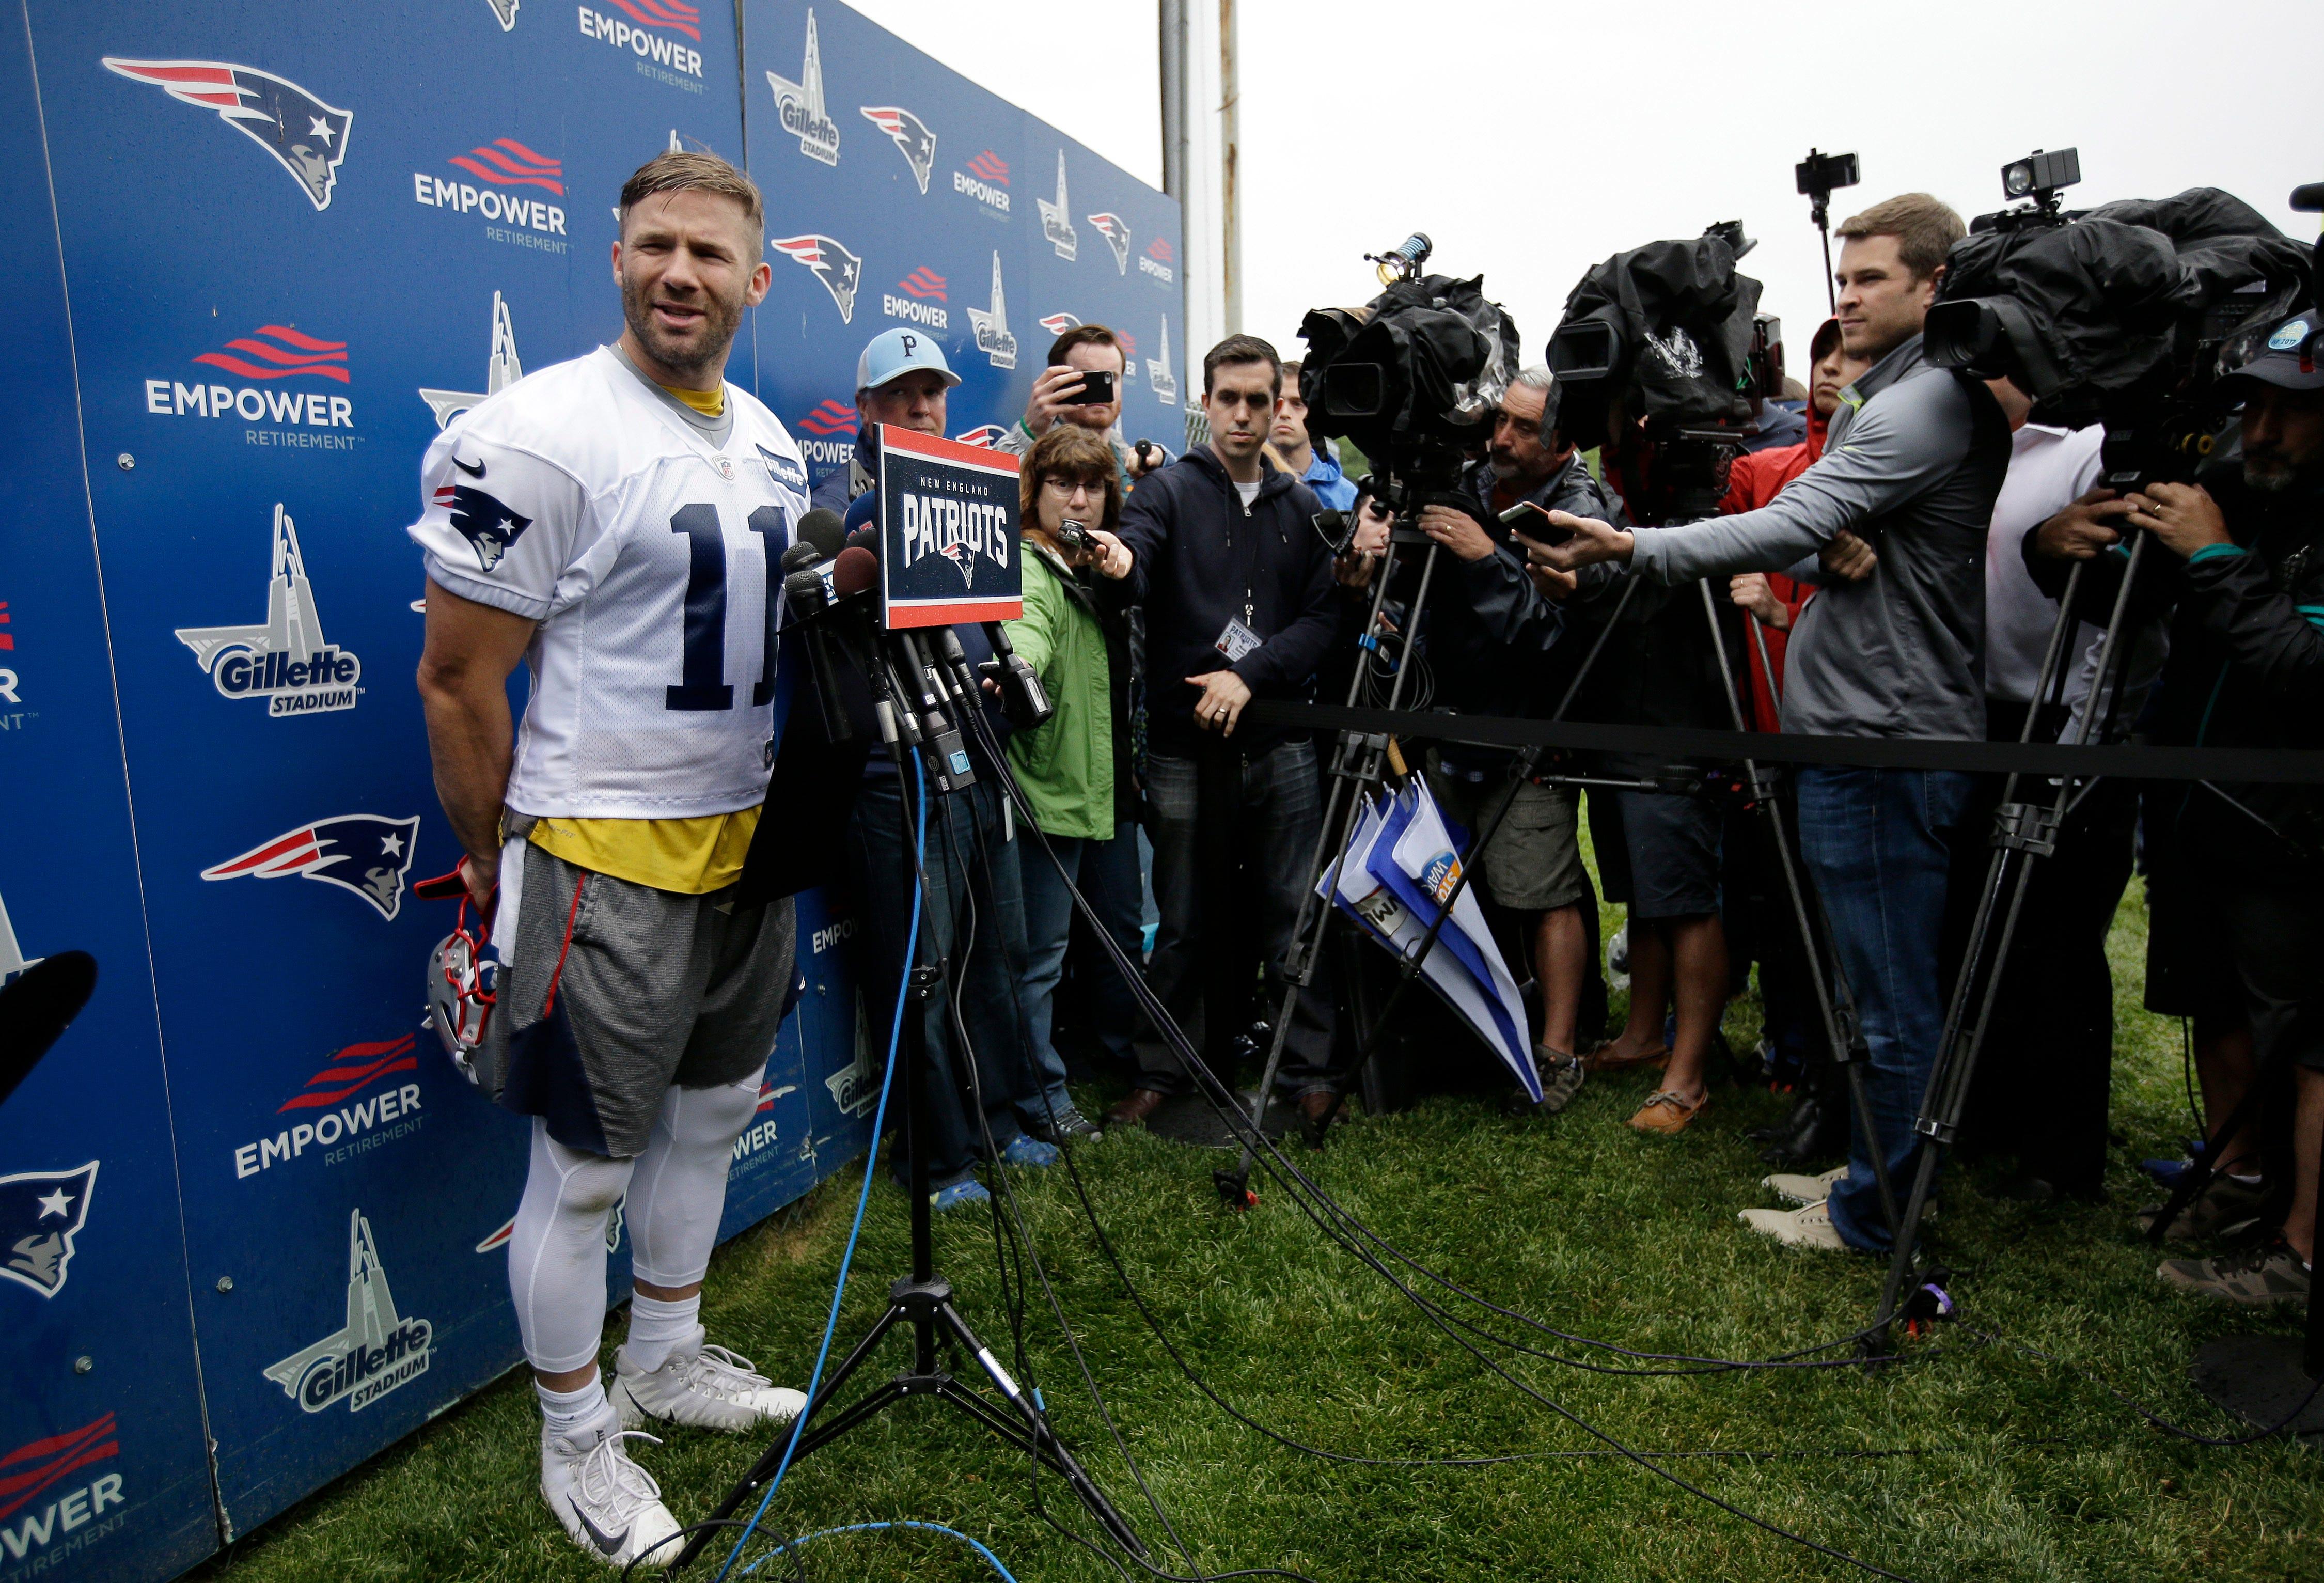 Gronk, Brady return to field as Patriots open minicamp